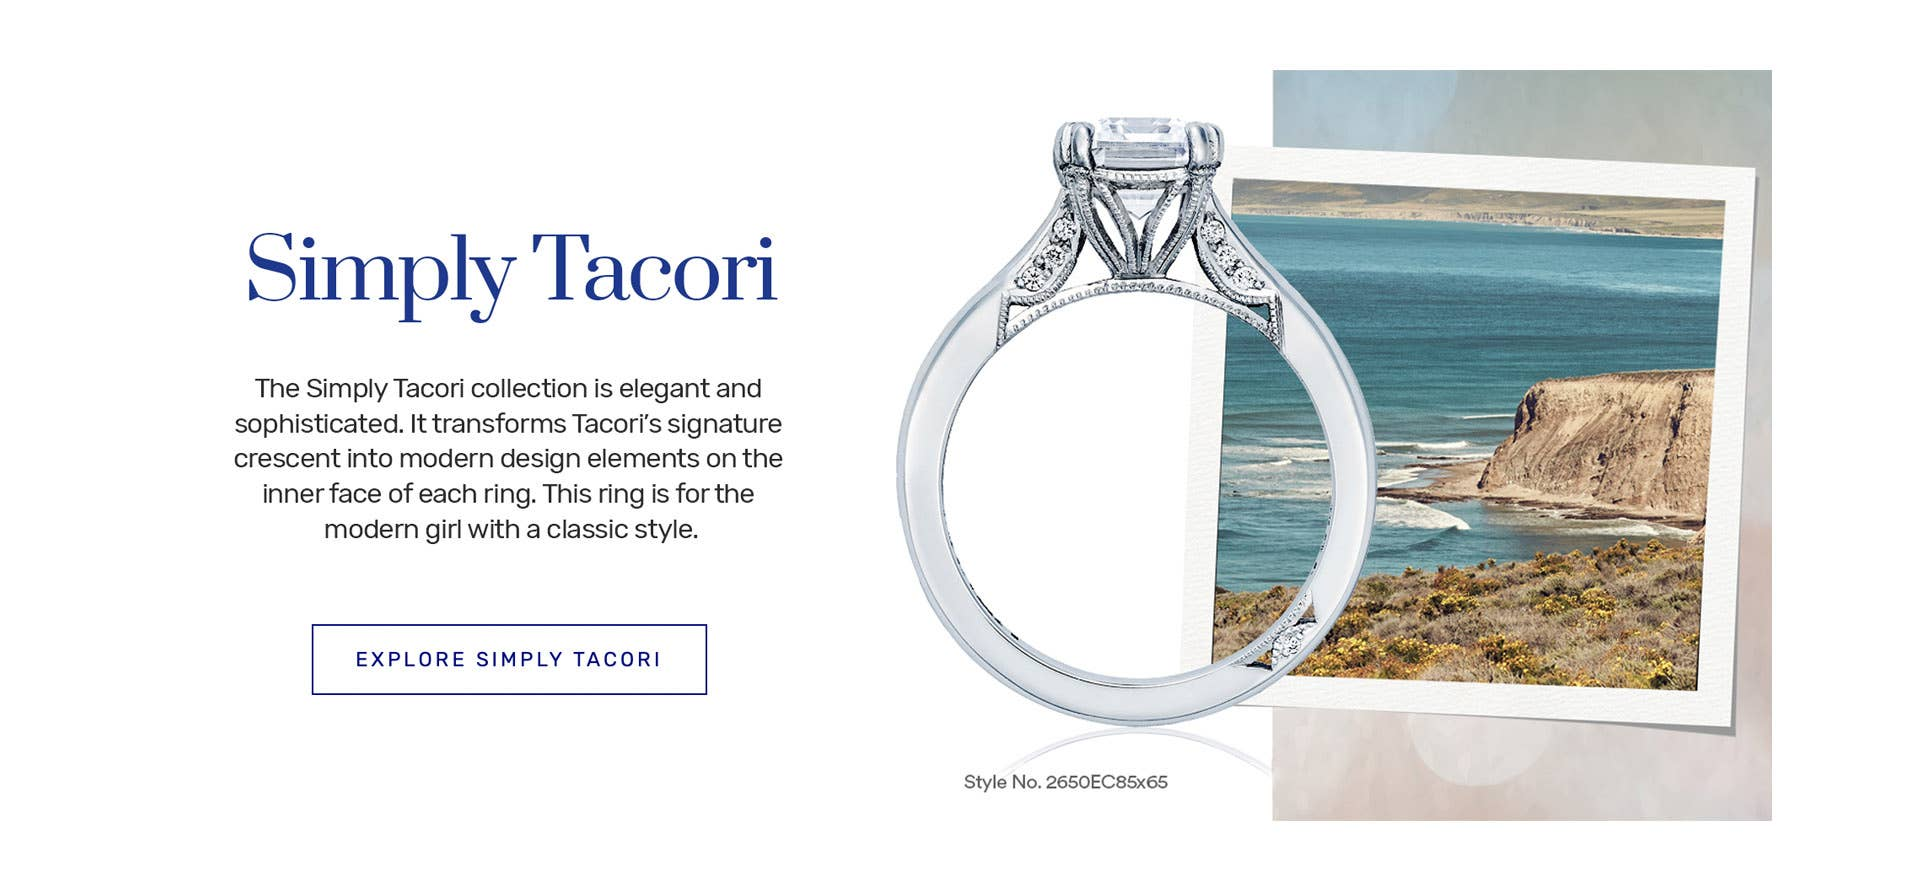 Simply Tacori